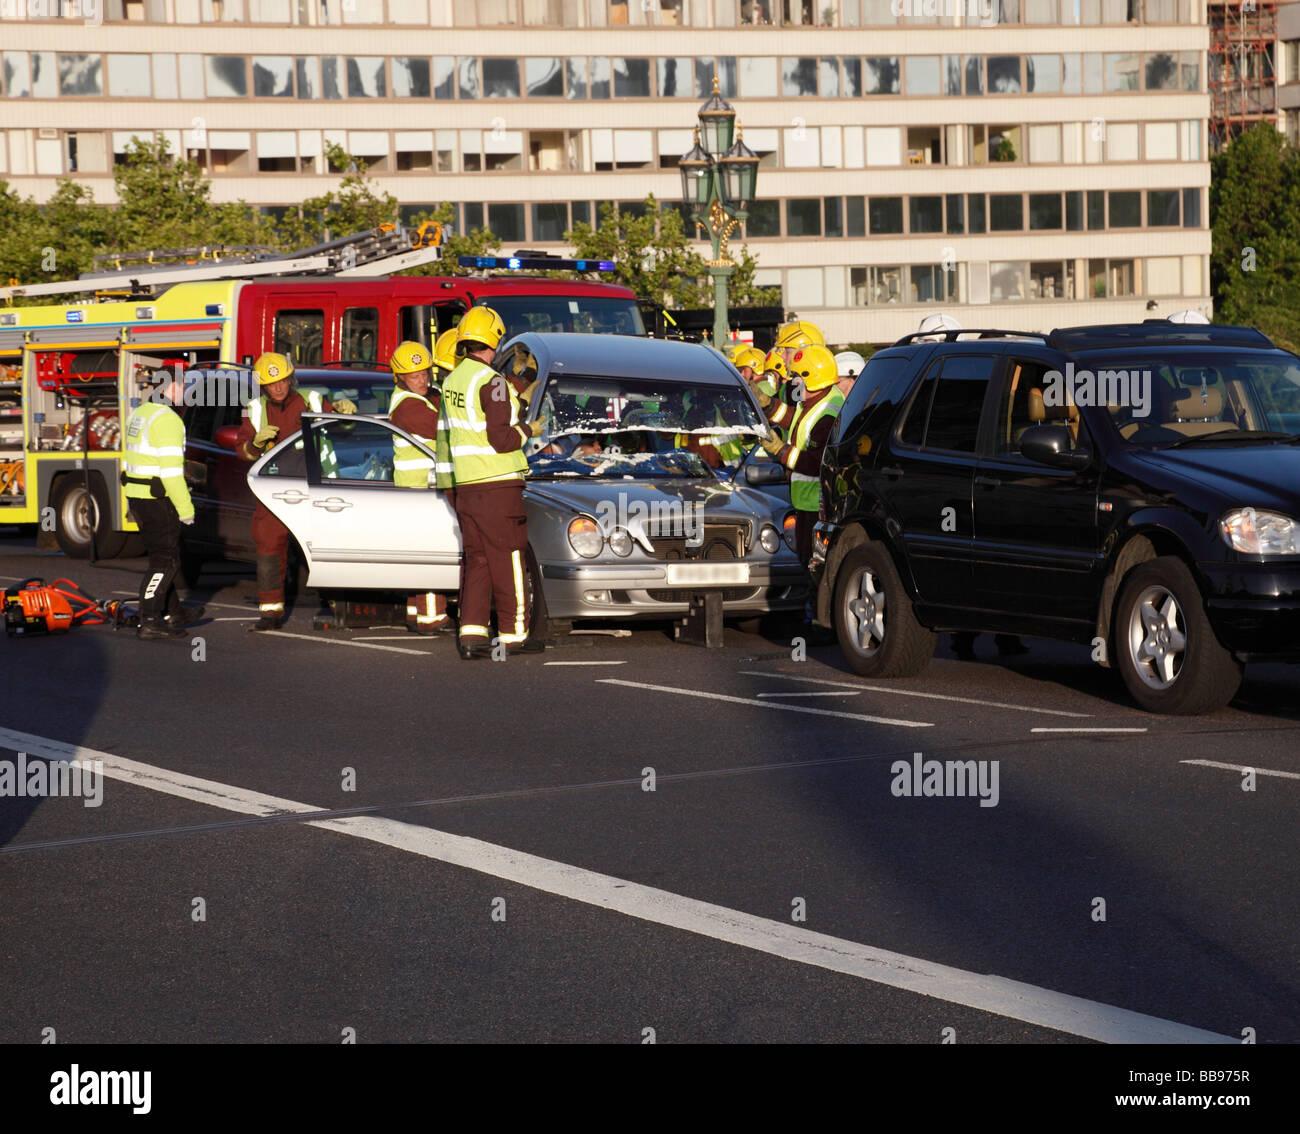 Car Crash In Westminster Stock Photos & Car Crash In